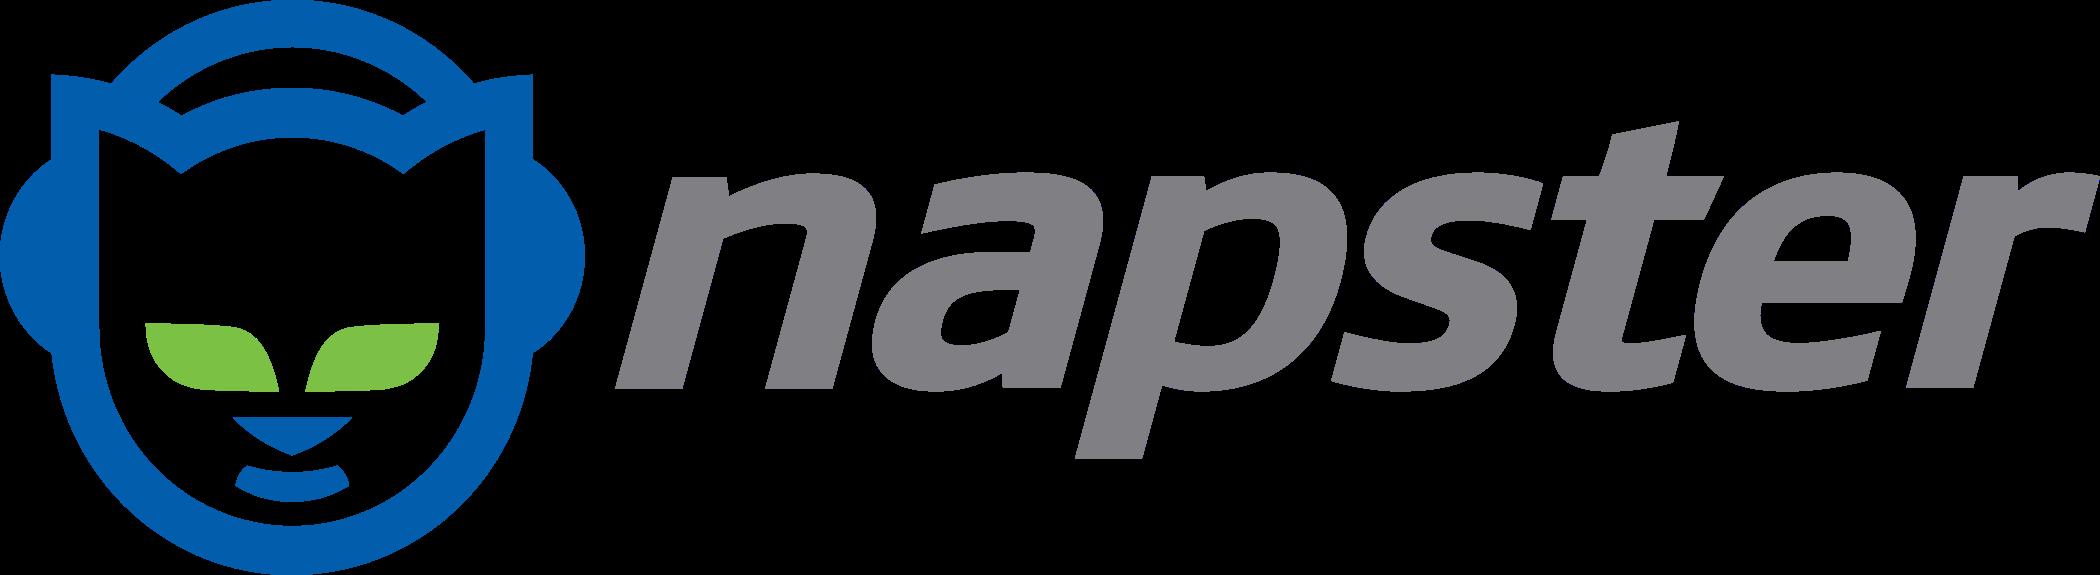 napster logo 2 1 - Napster Logo